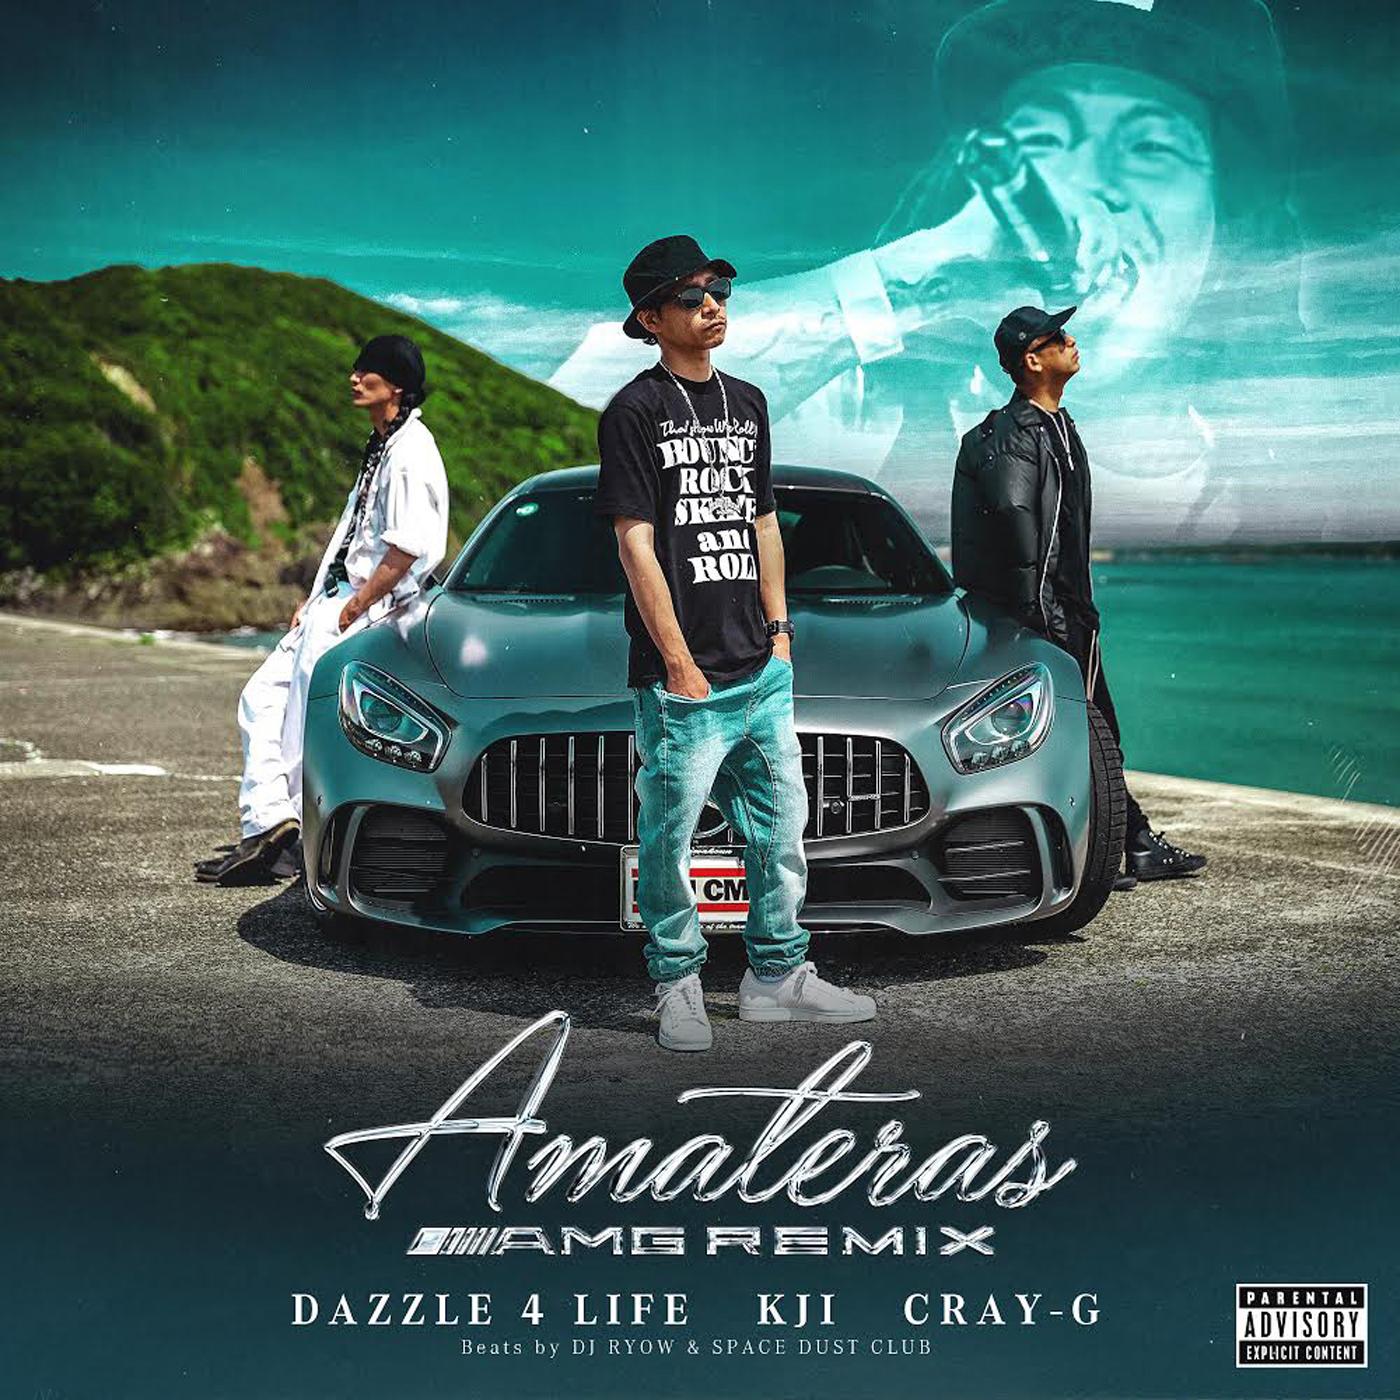 KJI feat. DAZZLE 4 LIFE , CRAY-G「AMATERAS A.M.G REMIX」